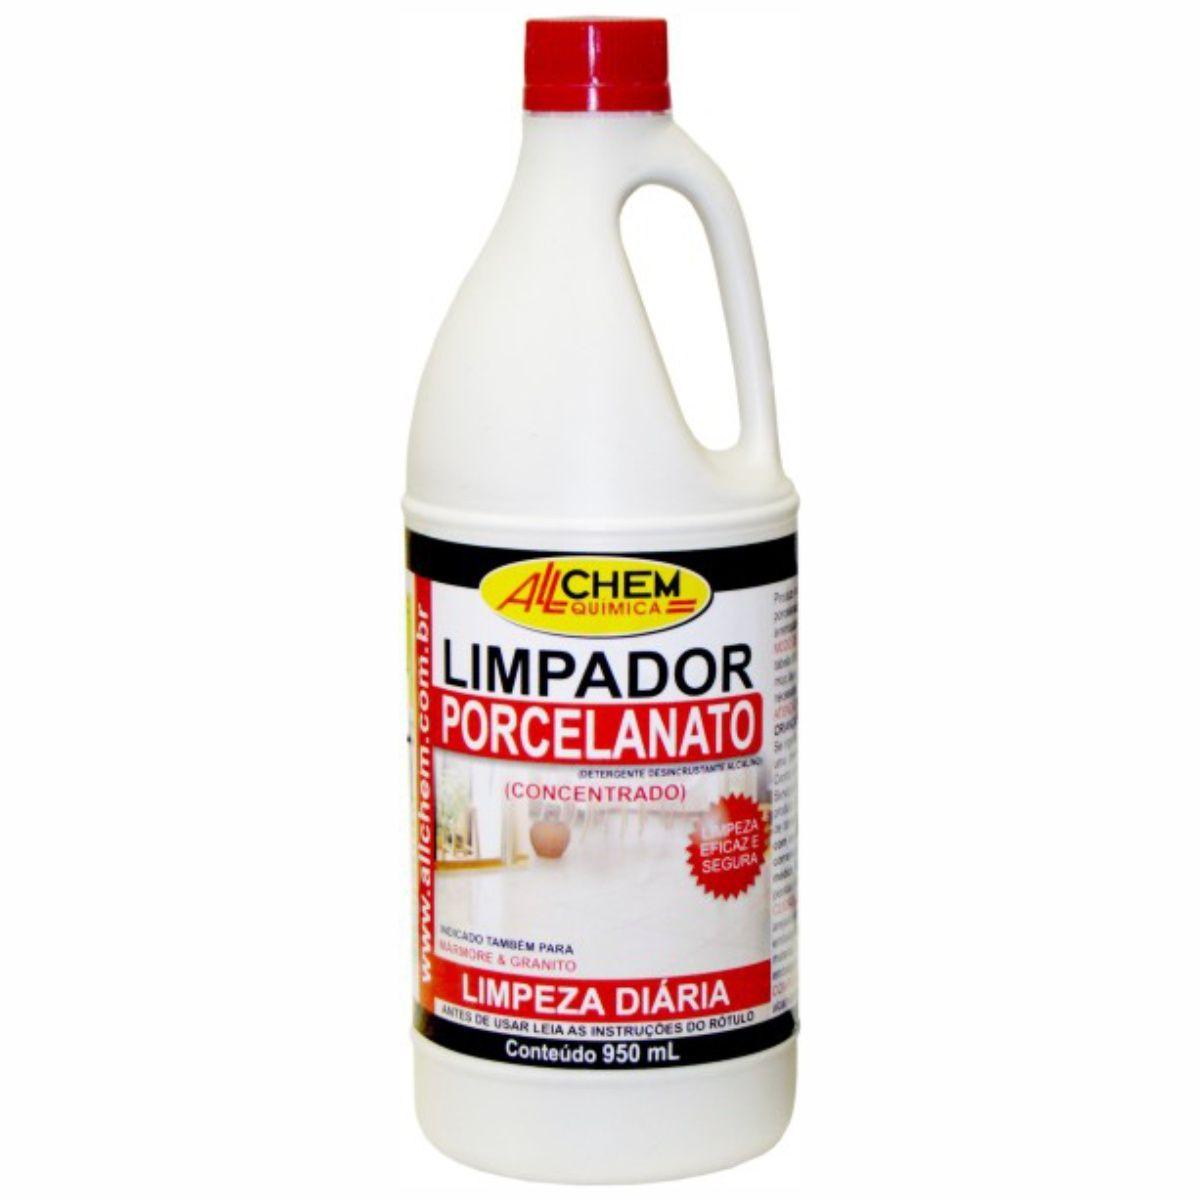 limpador-porcelanato-uso-diario-allchem